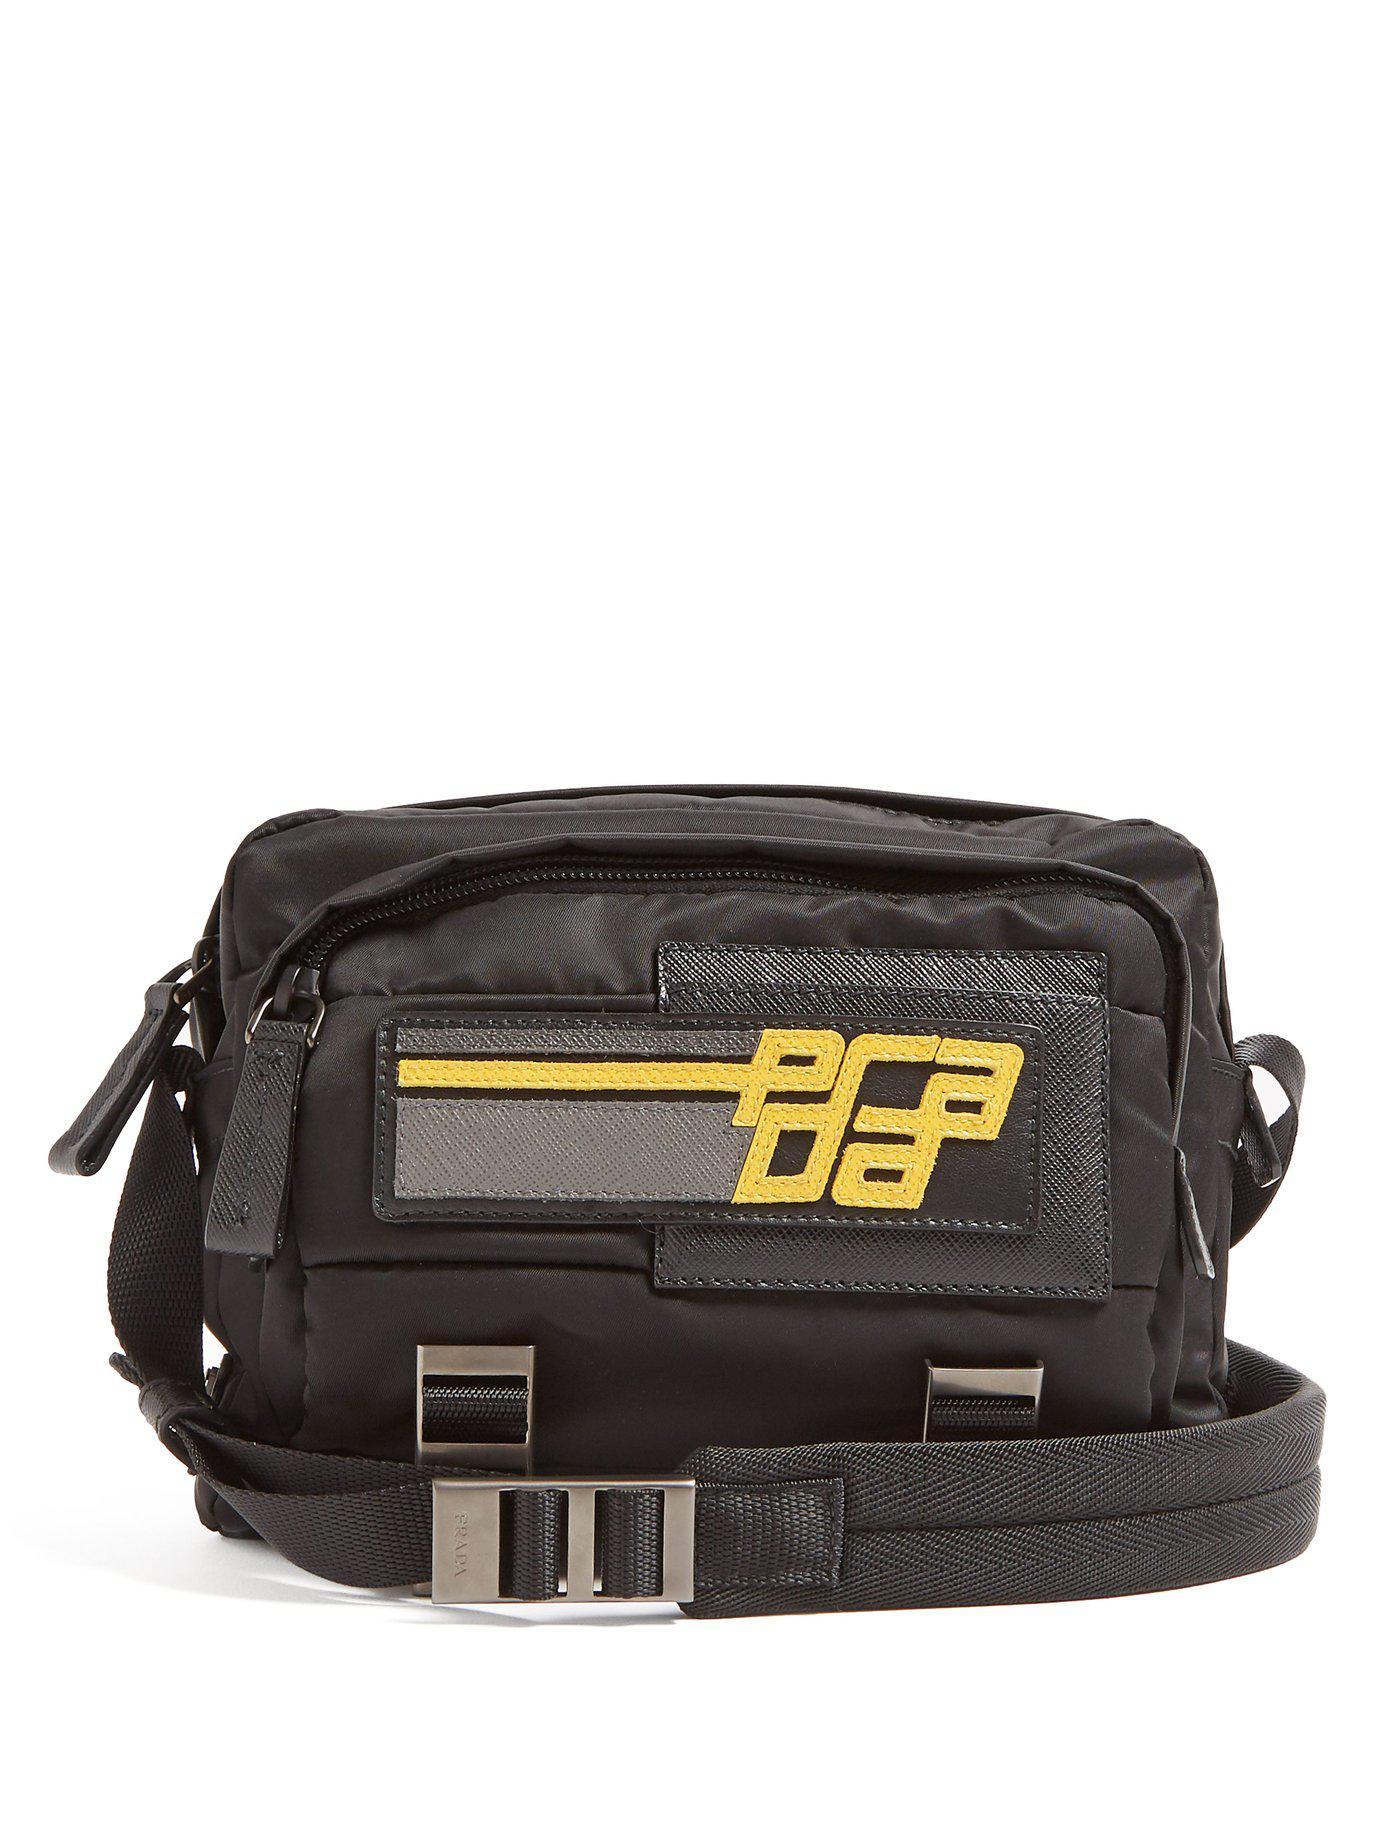 Lyst - Prada Logo Patch Nylon Cross Body Bag in Black for Men 853f0759b1616